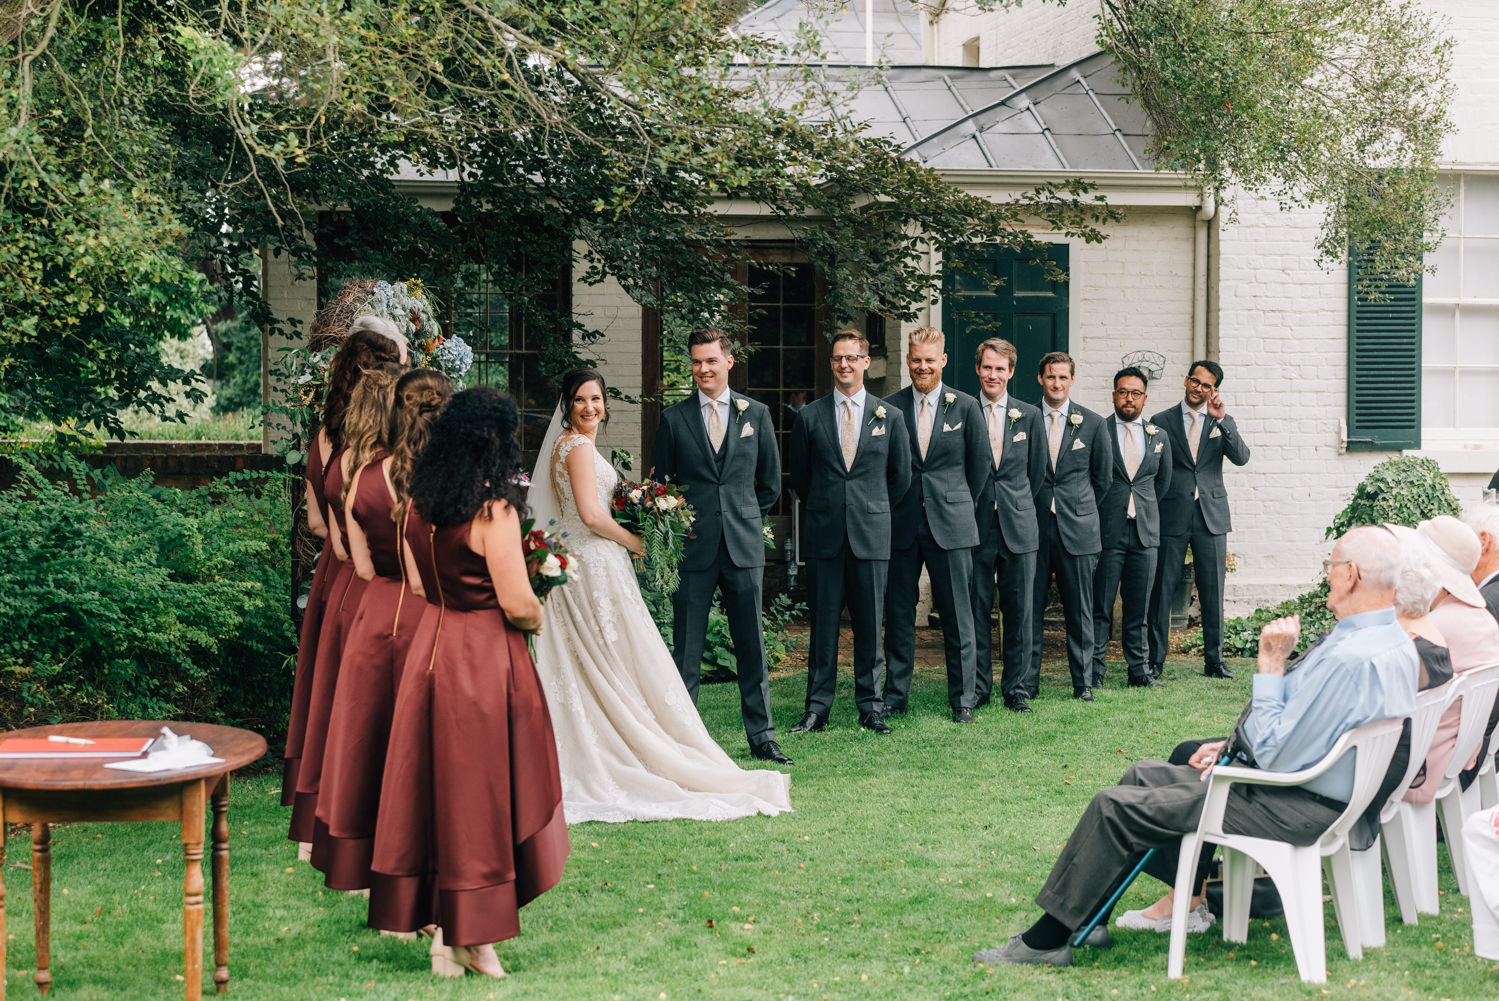 Brickendon-Wedding-Photographer-46.jpg